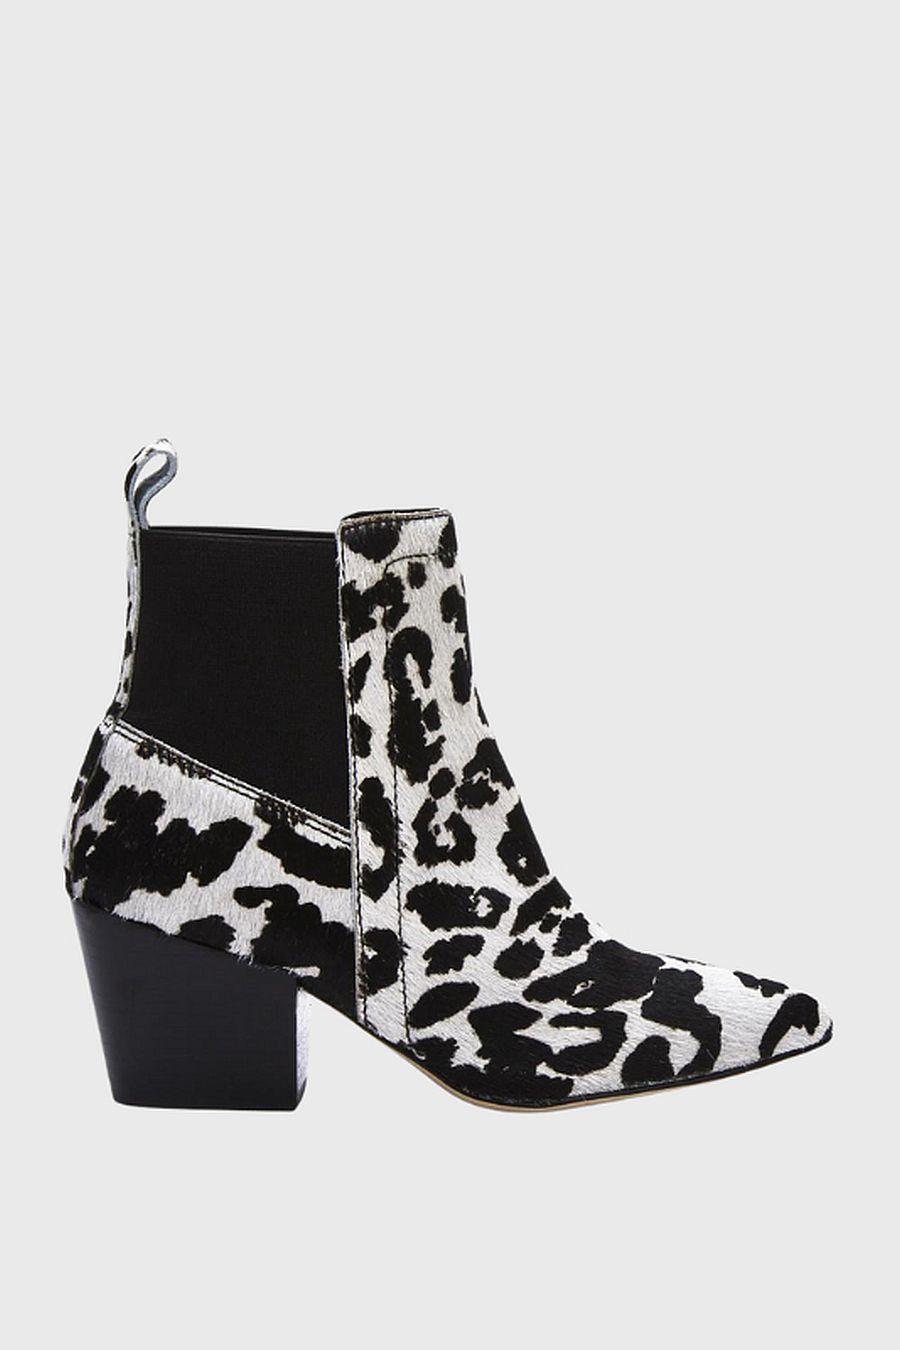 Matisse Footwear Harper Western Bootie - black/white cow spot